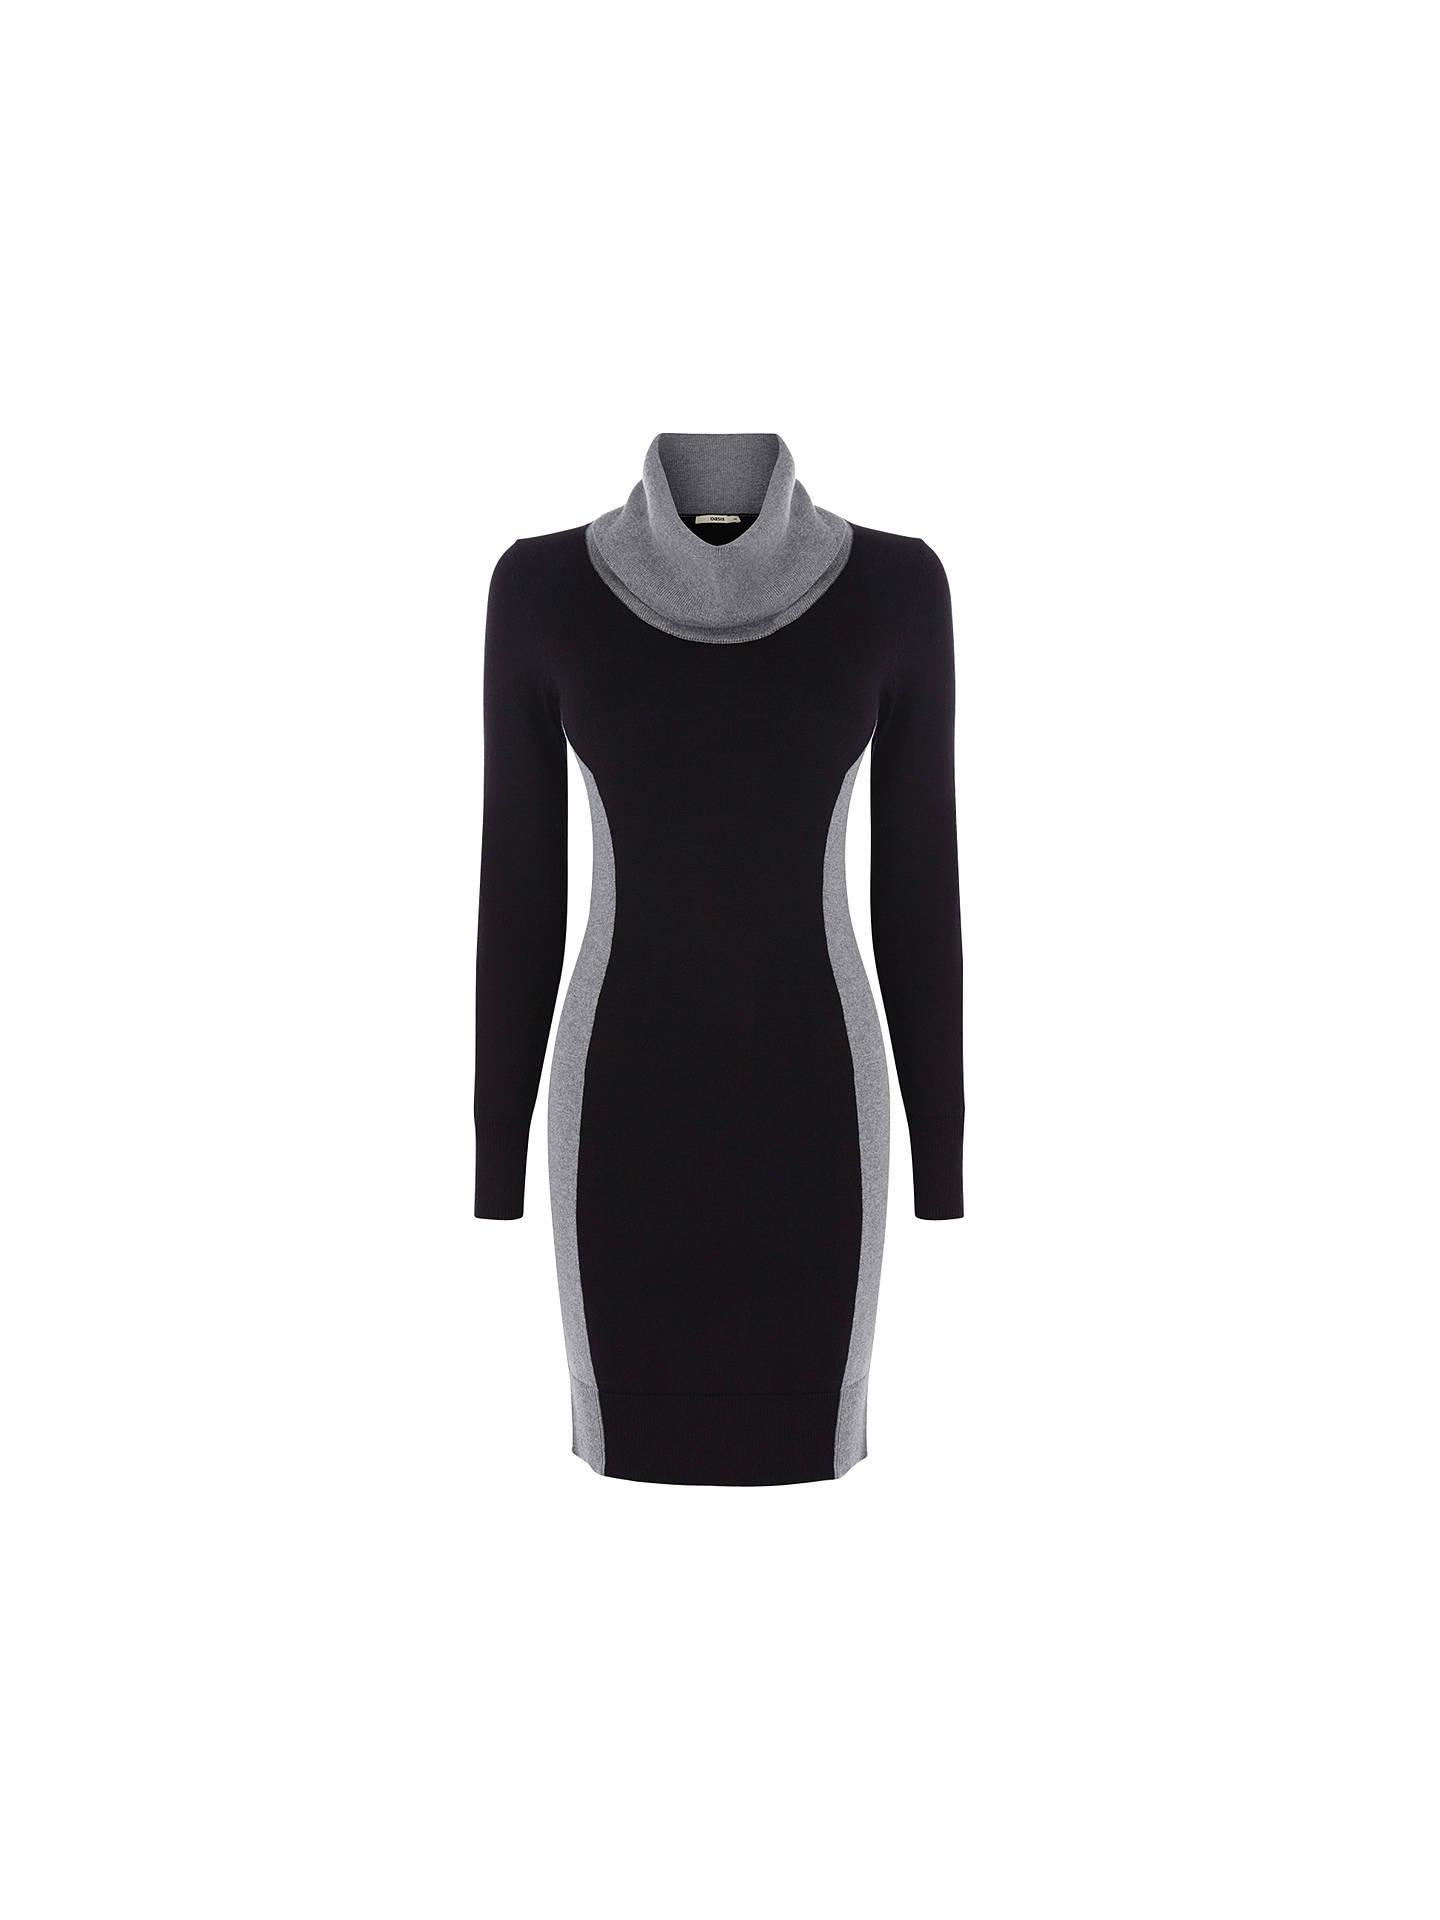 94463a377fc BuyOasis Colour Block Sweater Dress